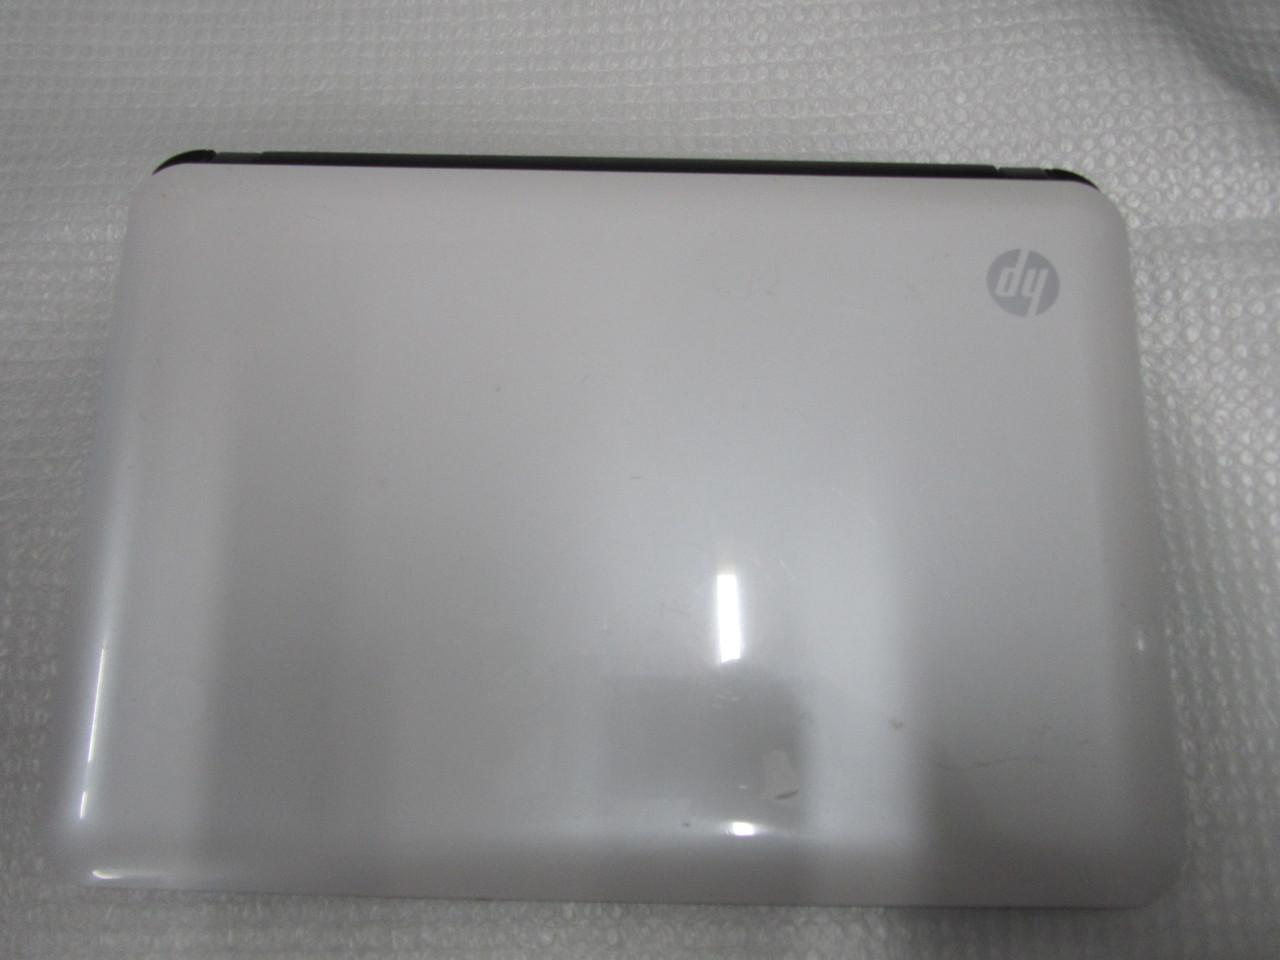 Двухъядерный HP mini Intel Atom N455 (1.66 ГГц) 120 Гб